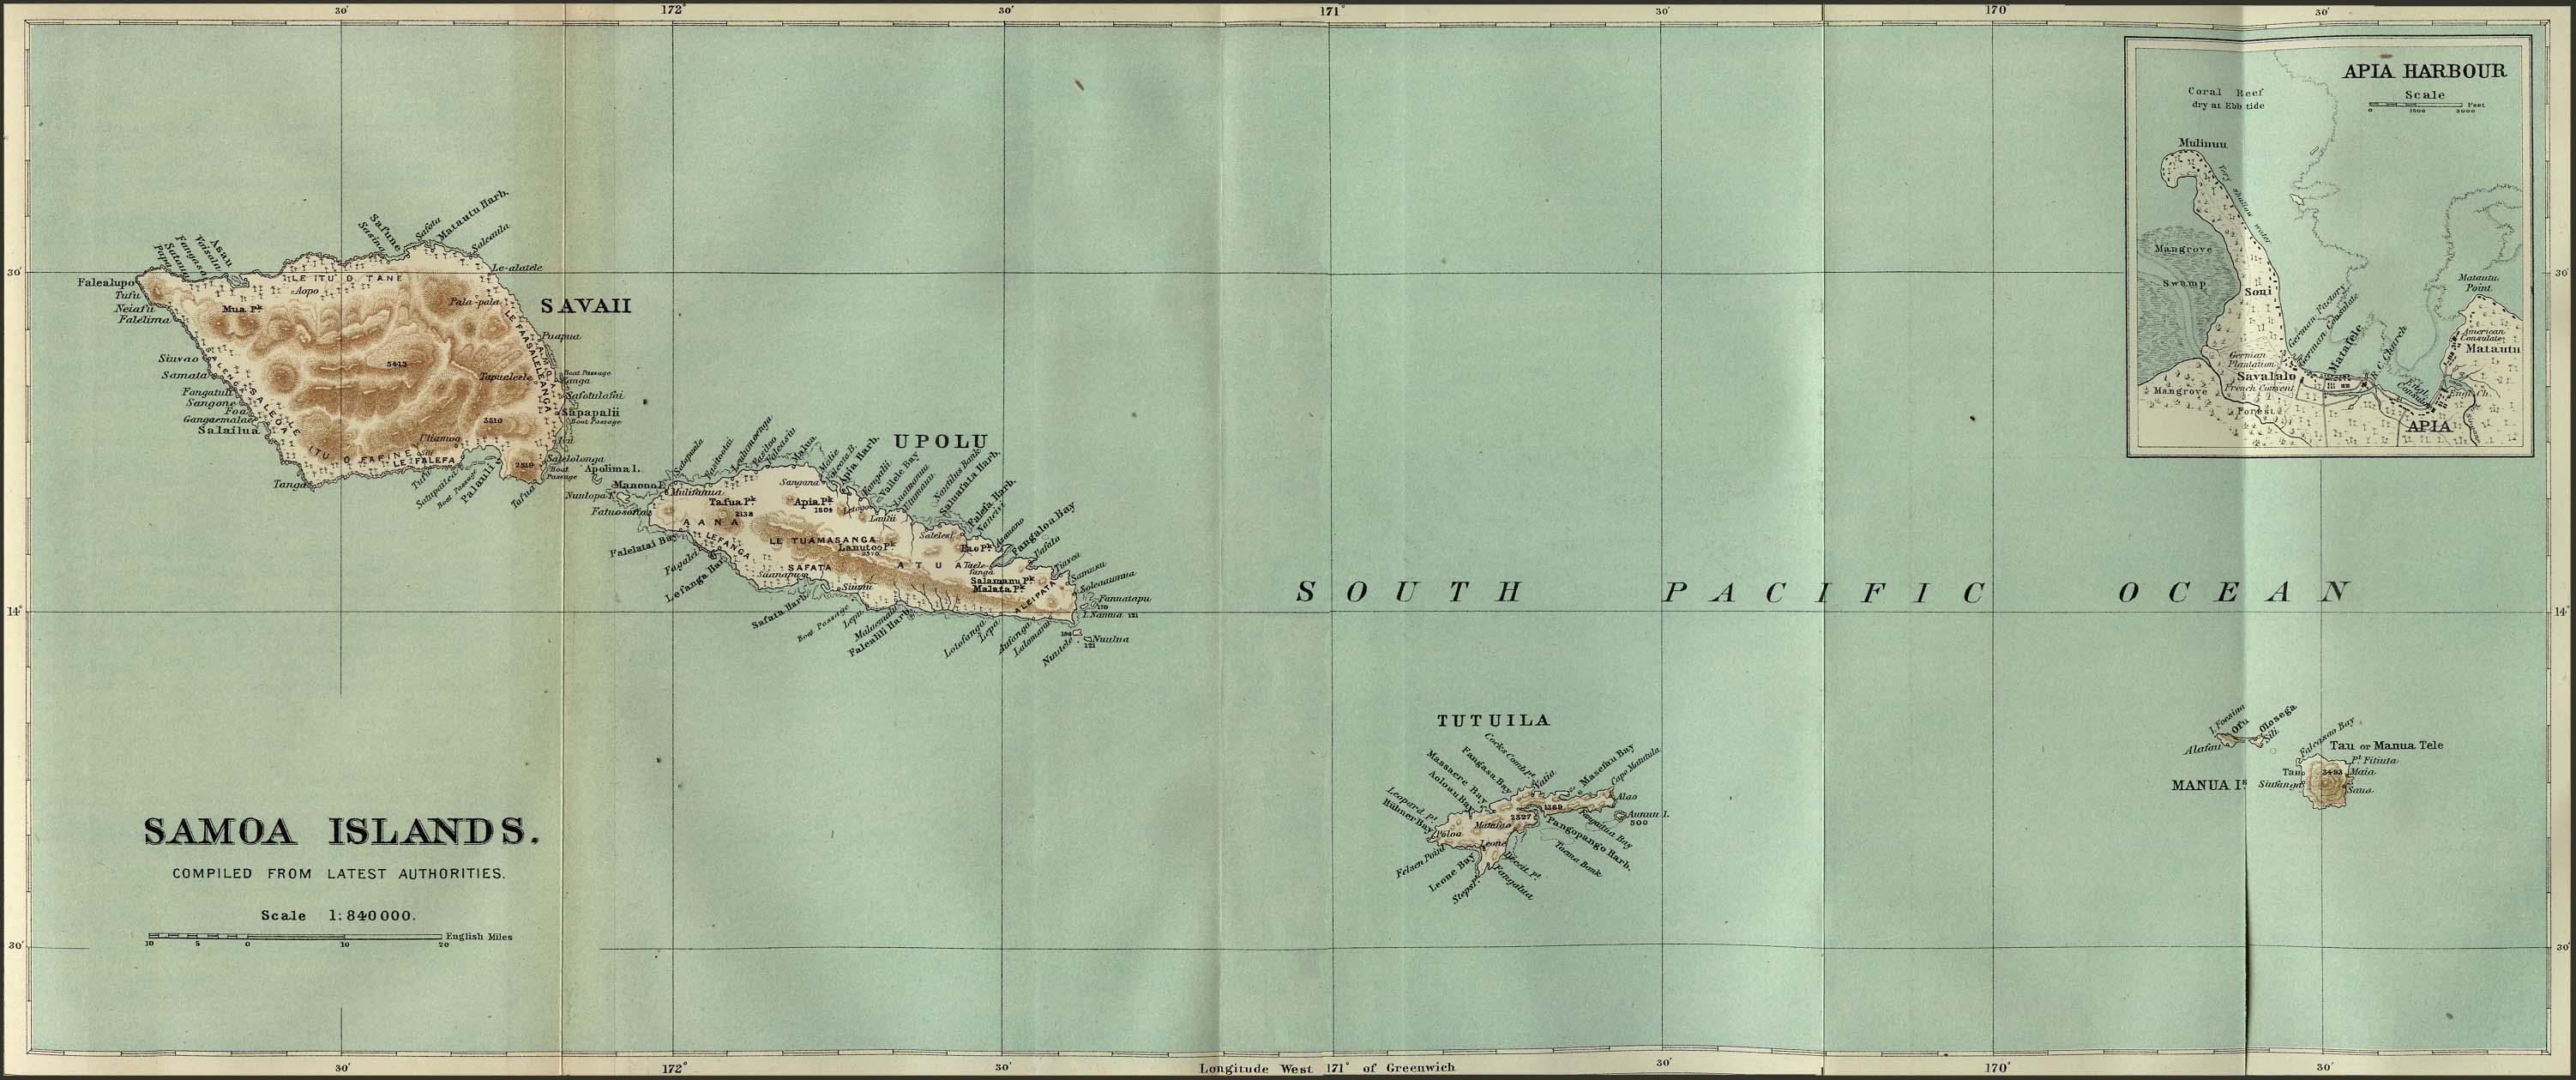 Islas Samoa Mapa 1889